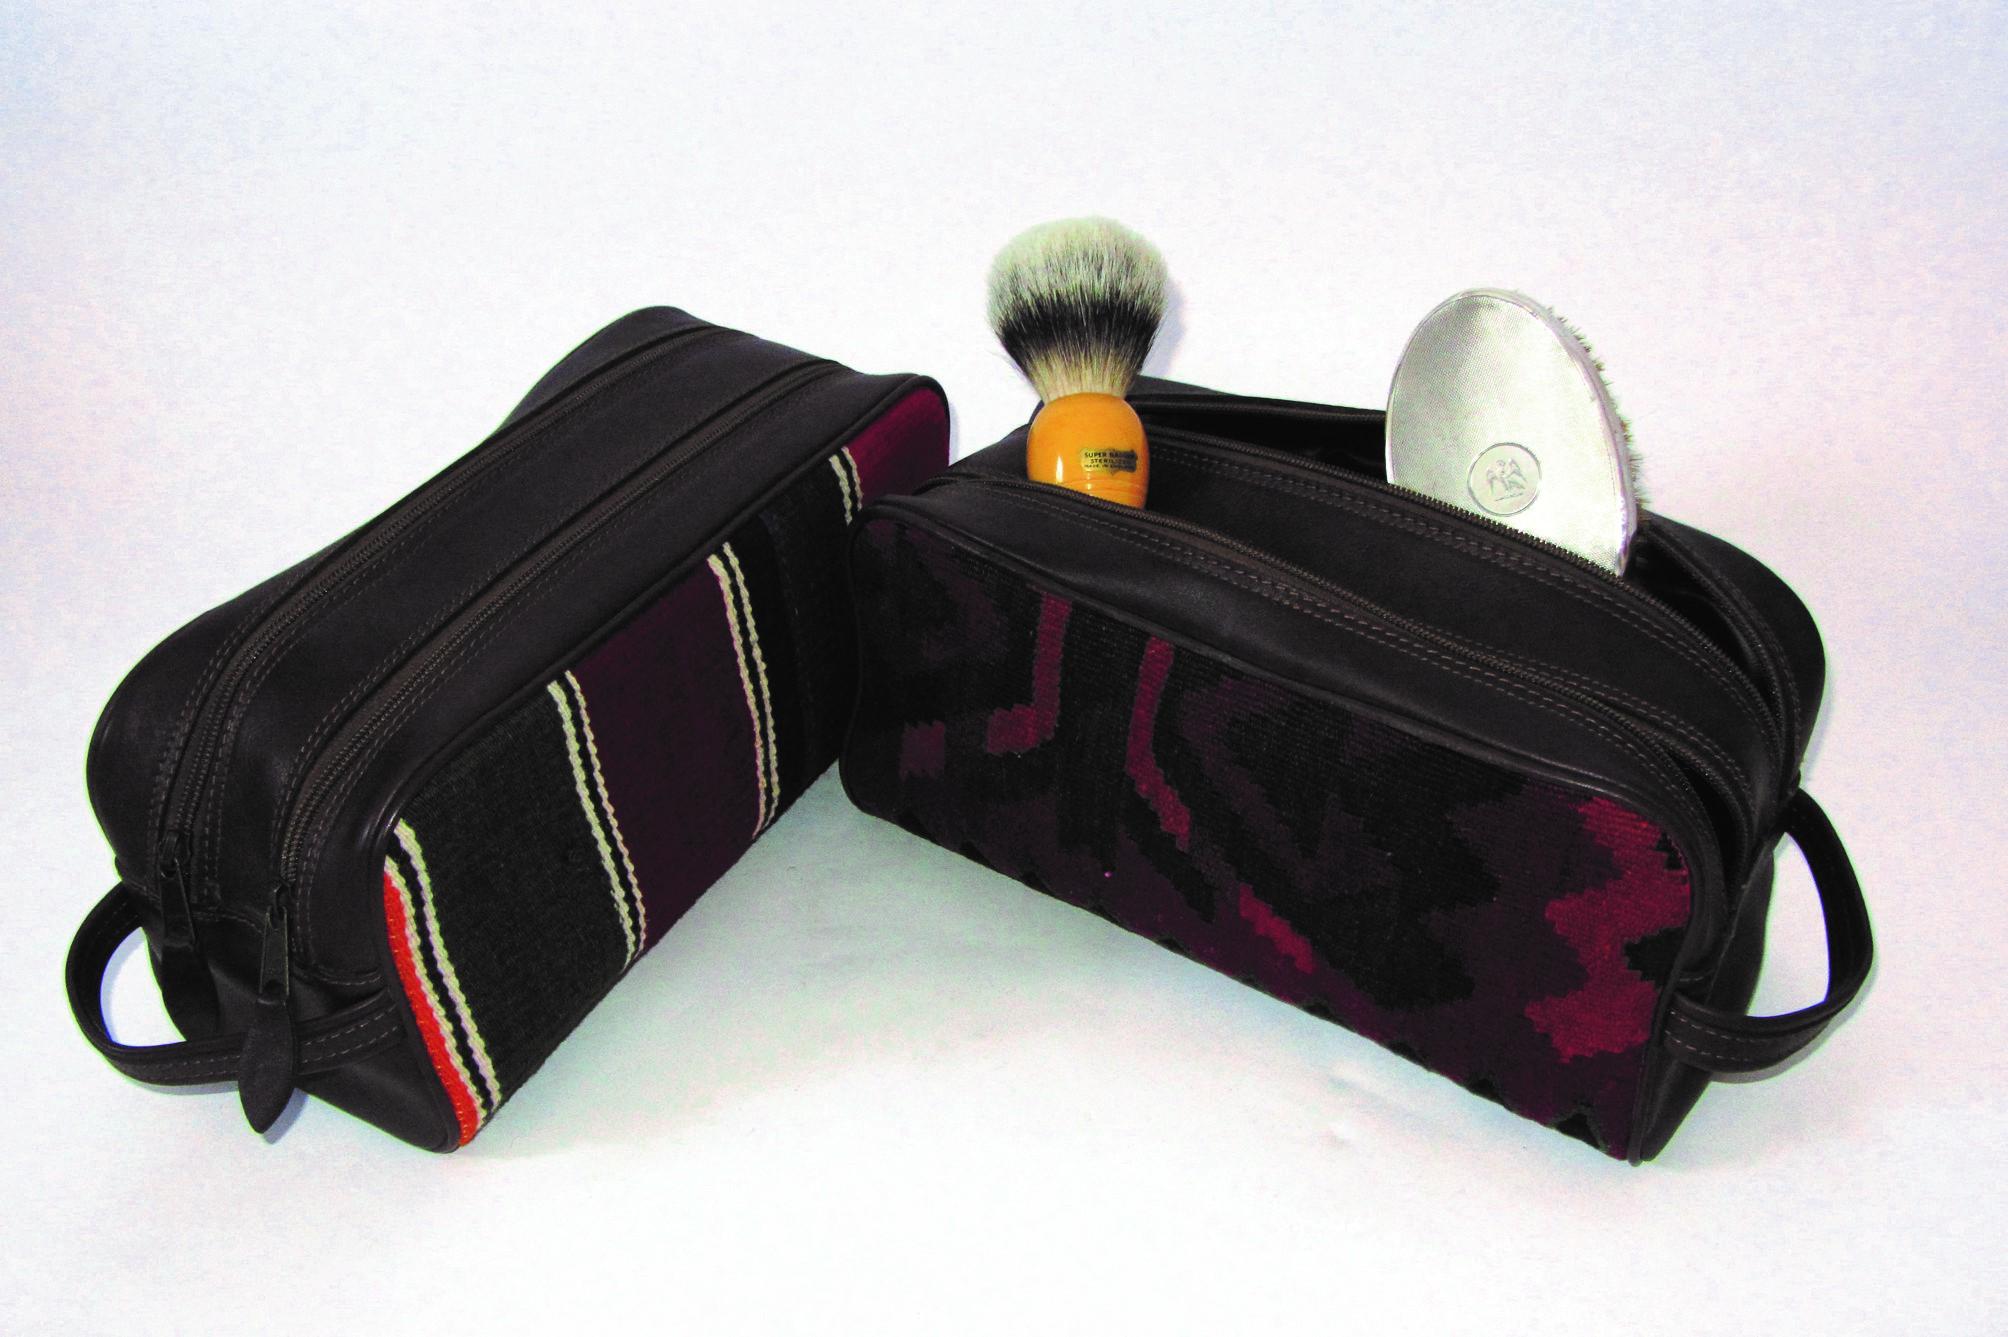 Nomad Ideas Kilim Sponge Bag